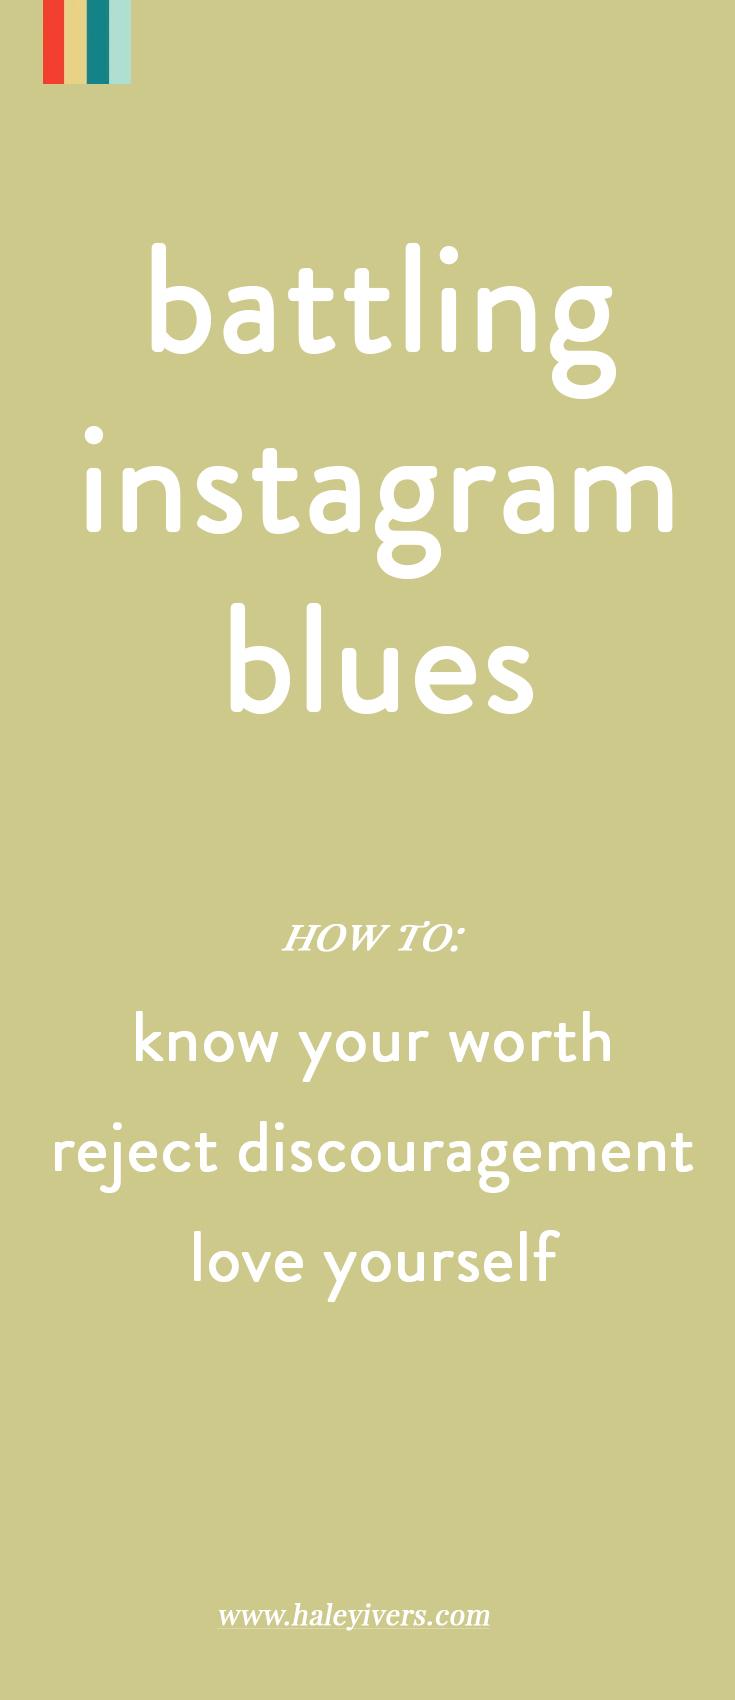 battling instagram blues.jpg